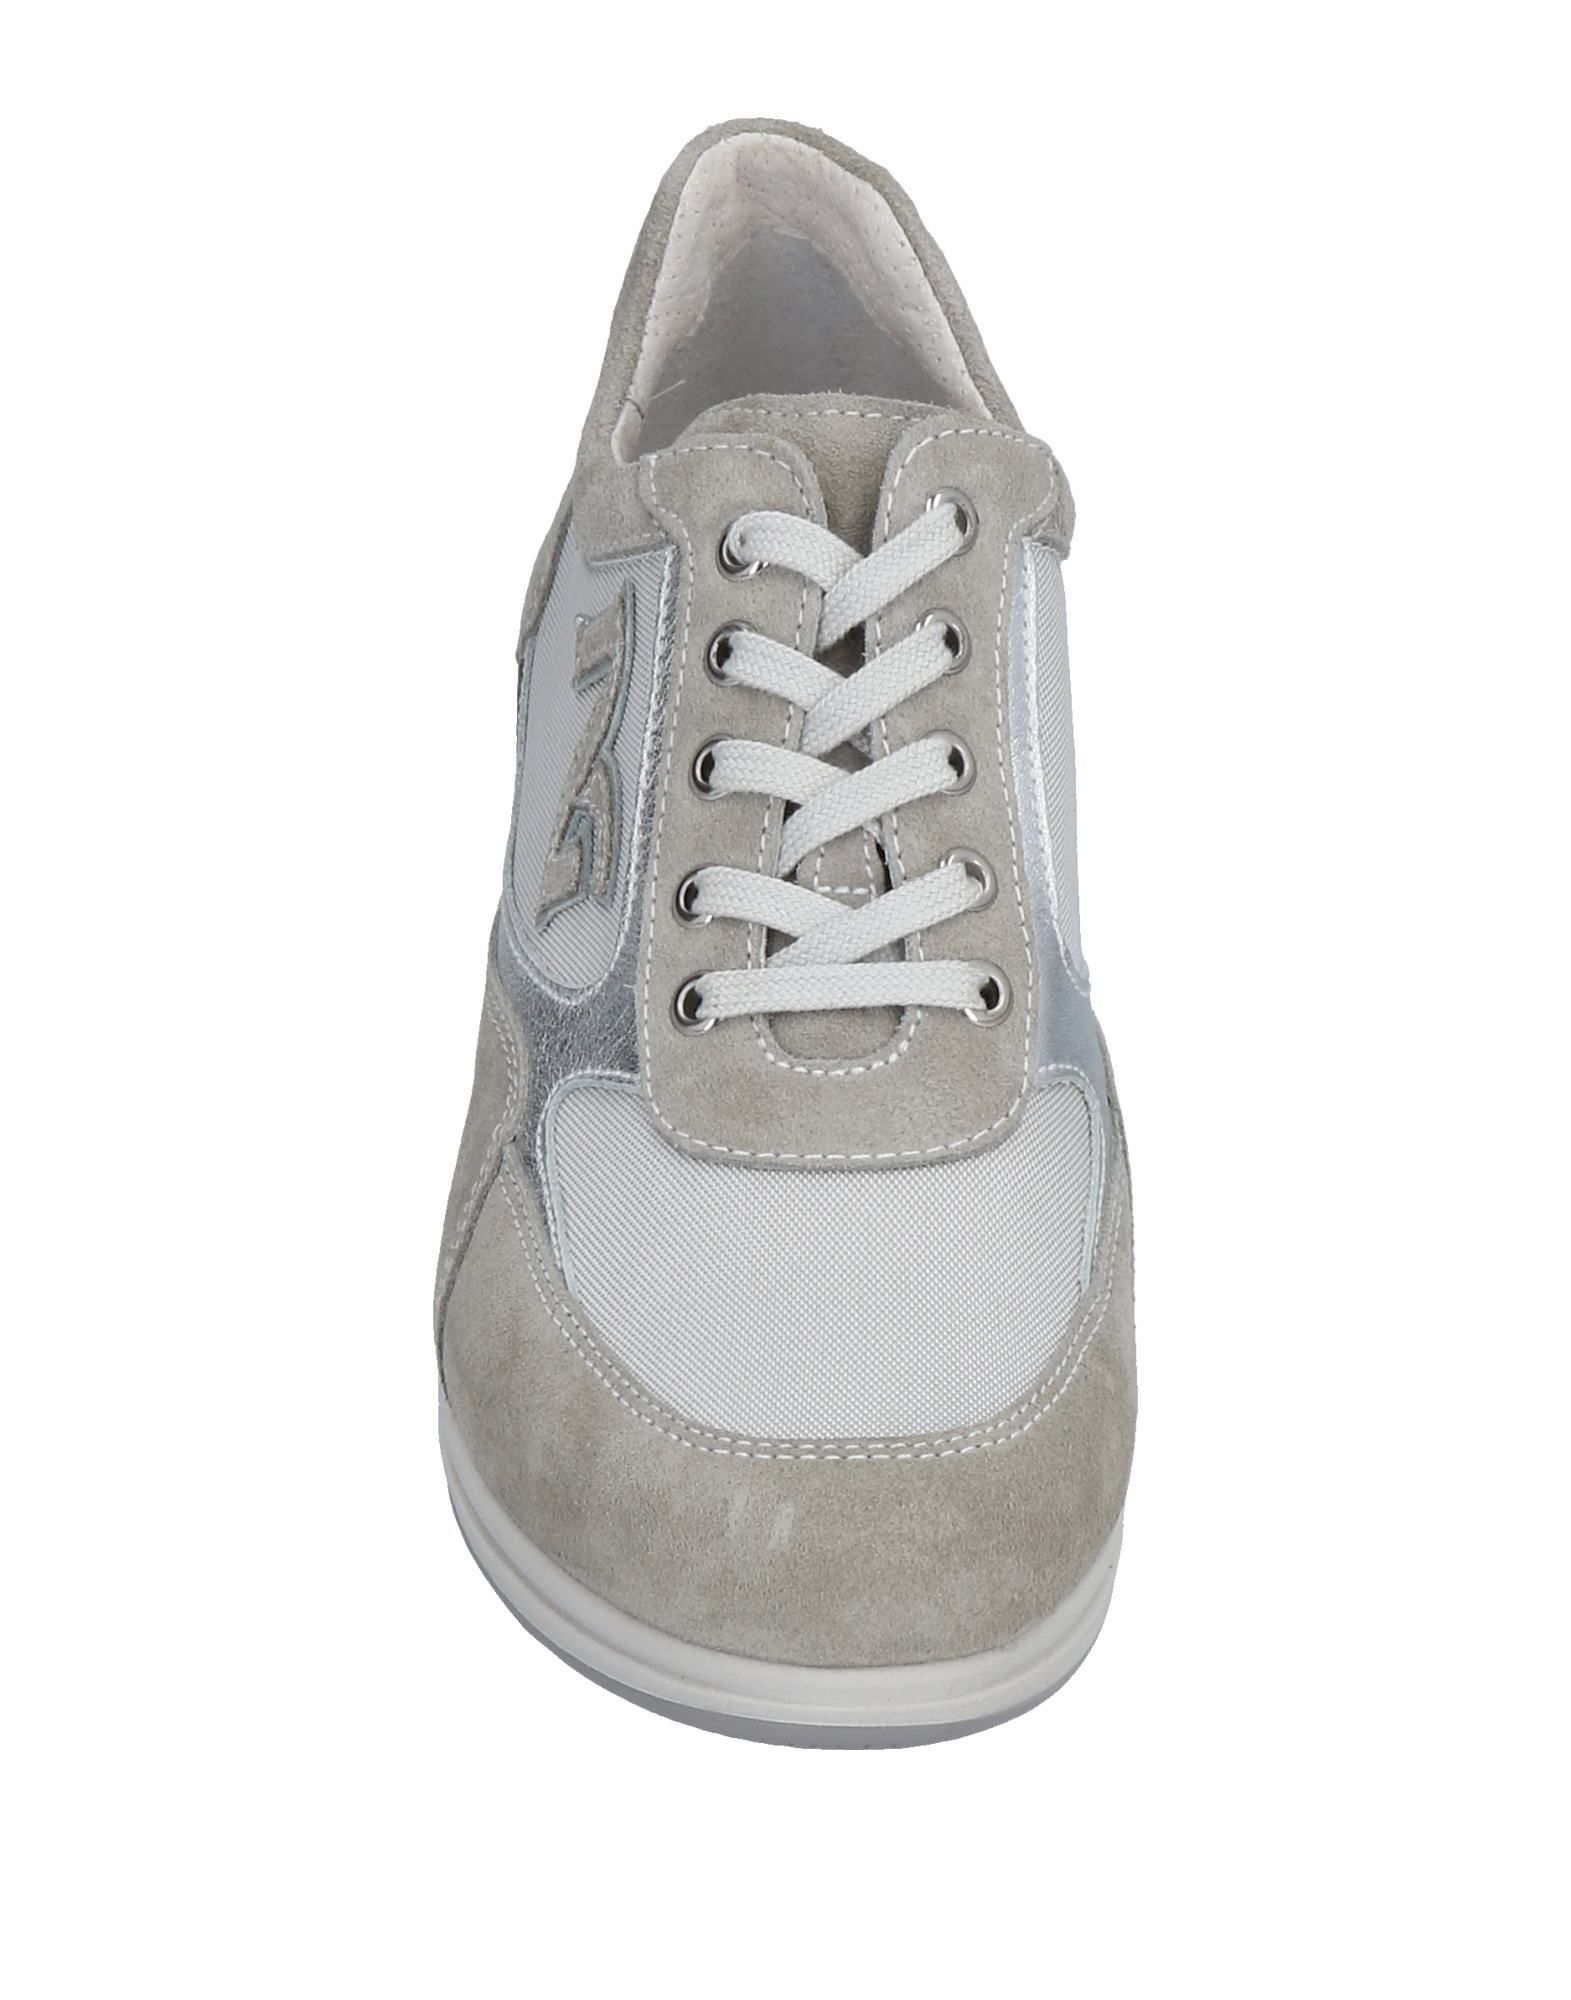 Nero Giardini beliebte Sneakers Damen  11484049WT Gute Qualität beliebte Giardini Schuhe 230382